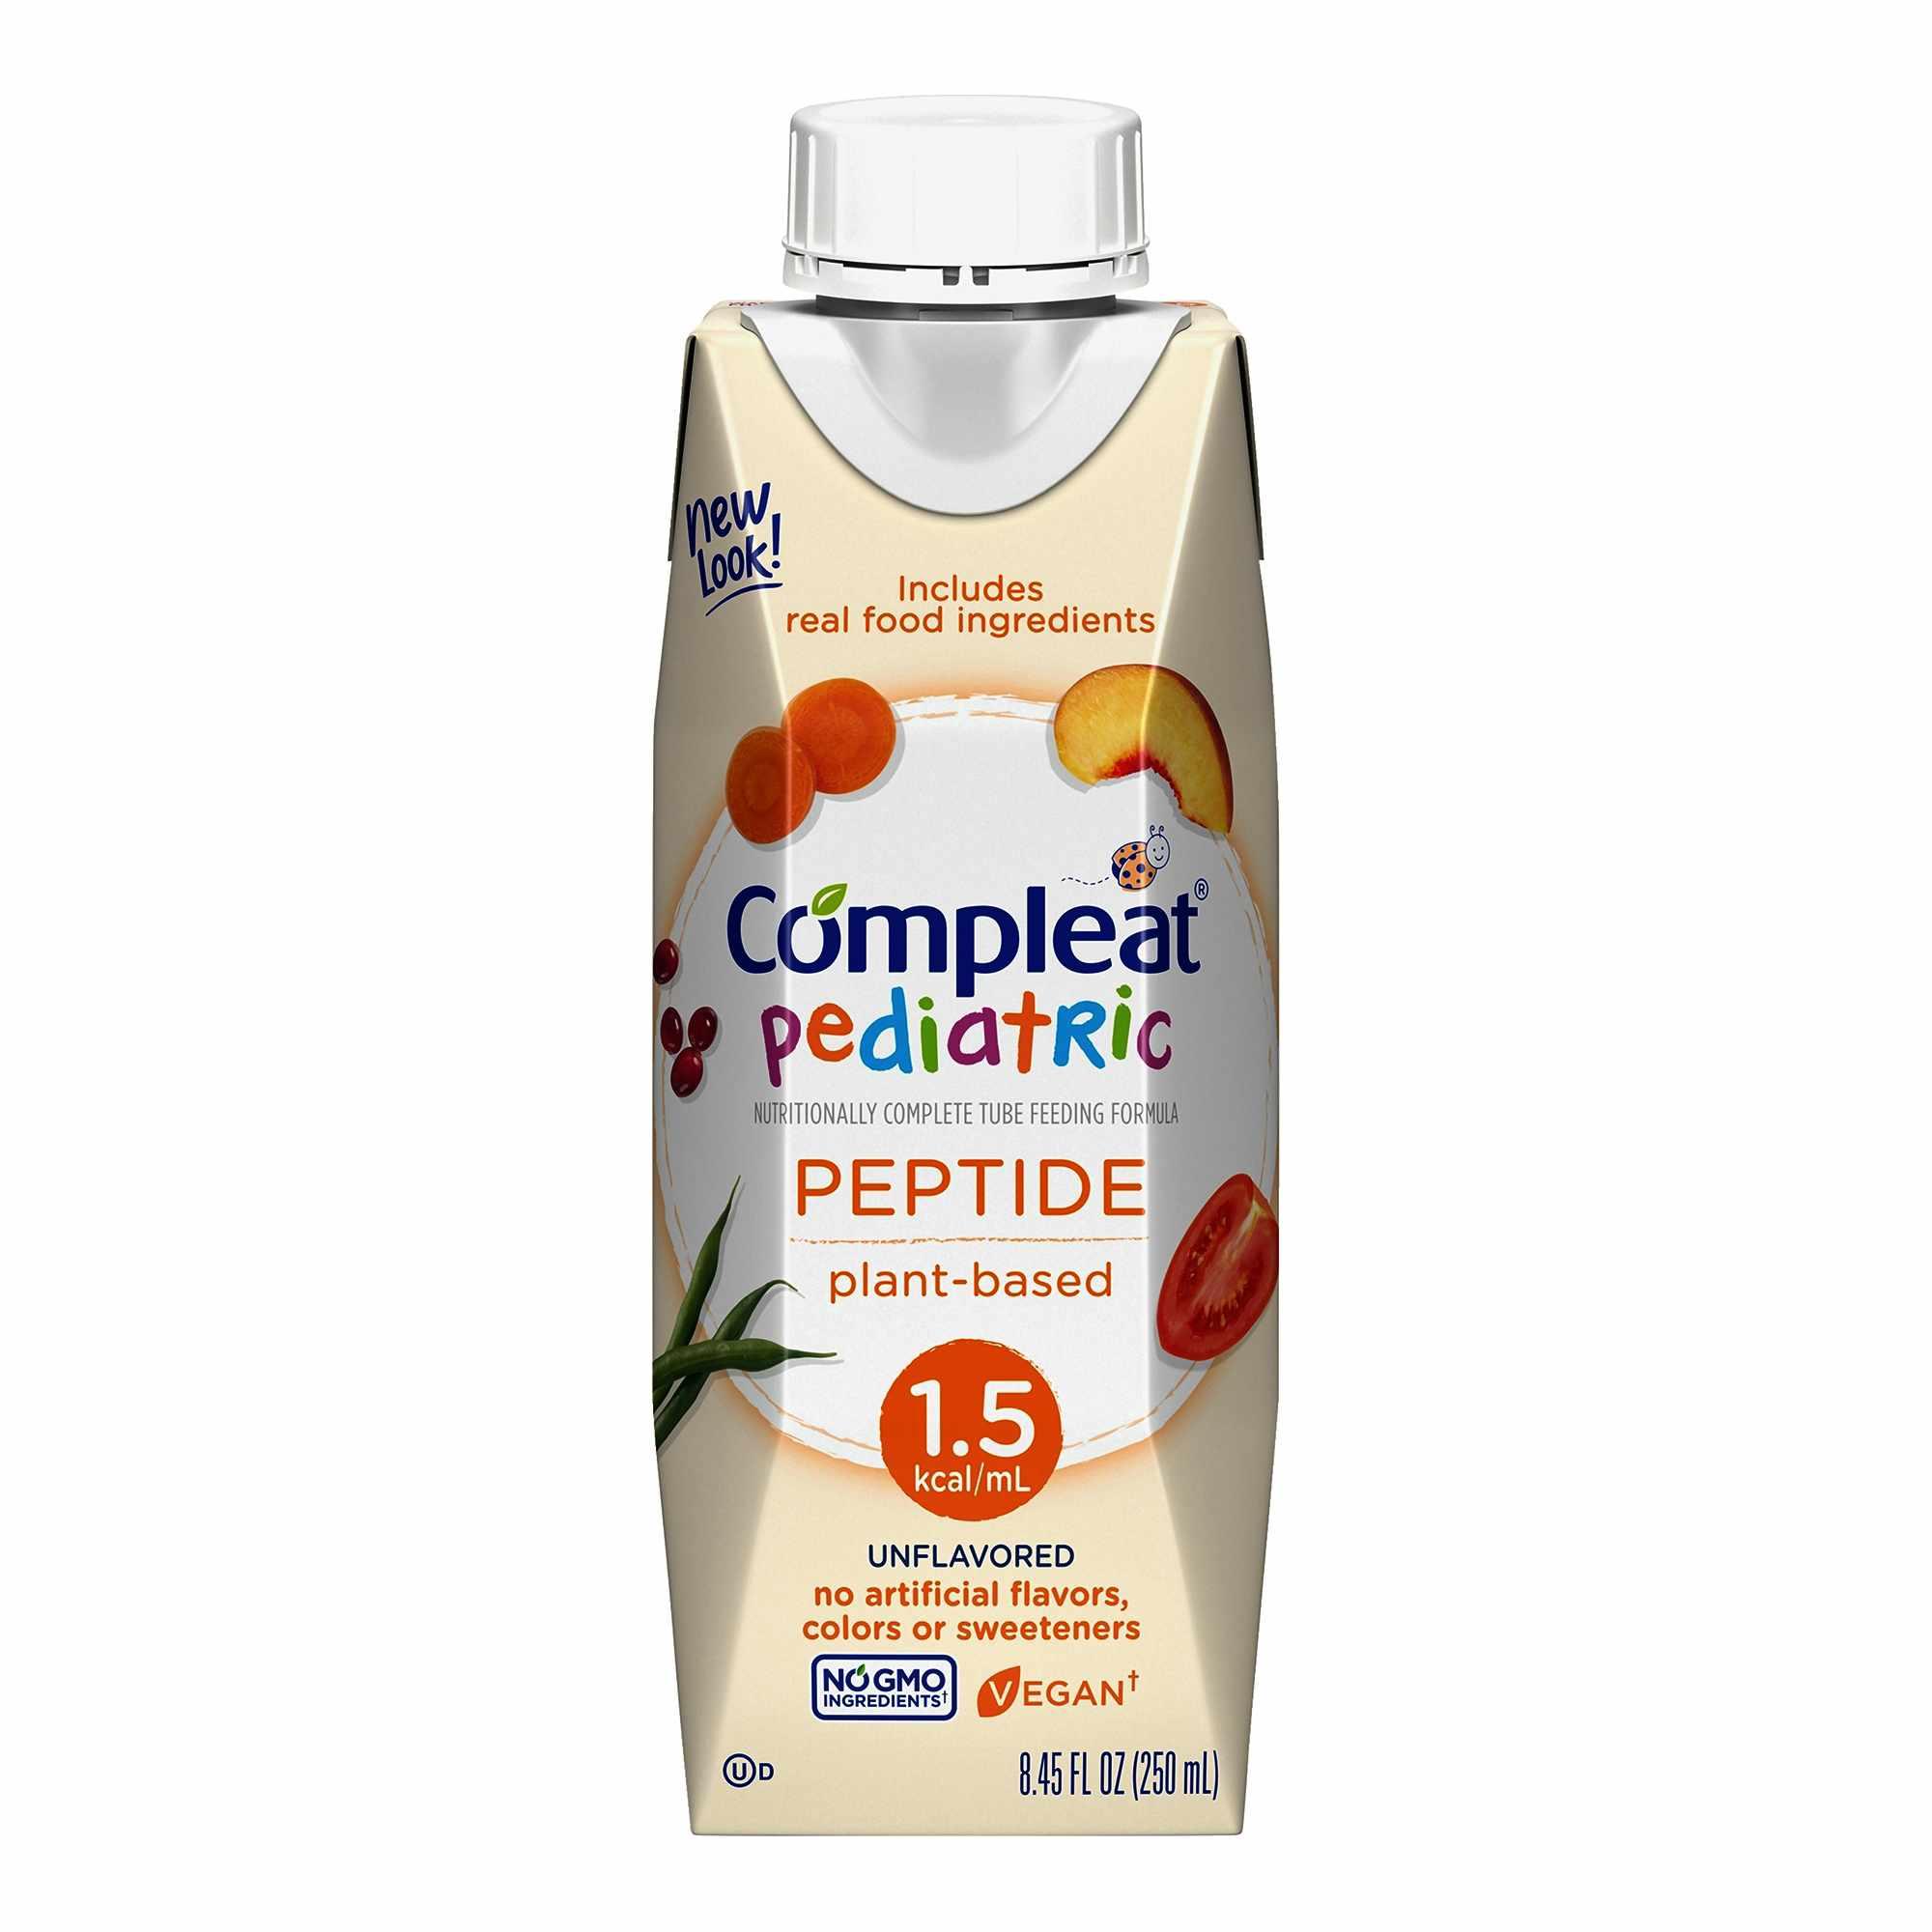 Nestle Compleat Pediatric Peptide Nutritional Formula